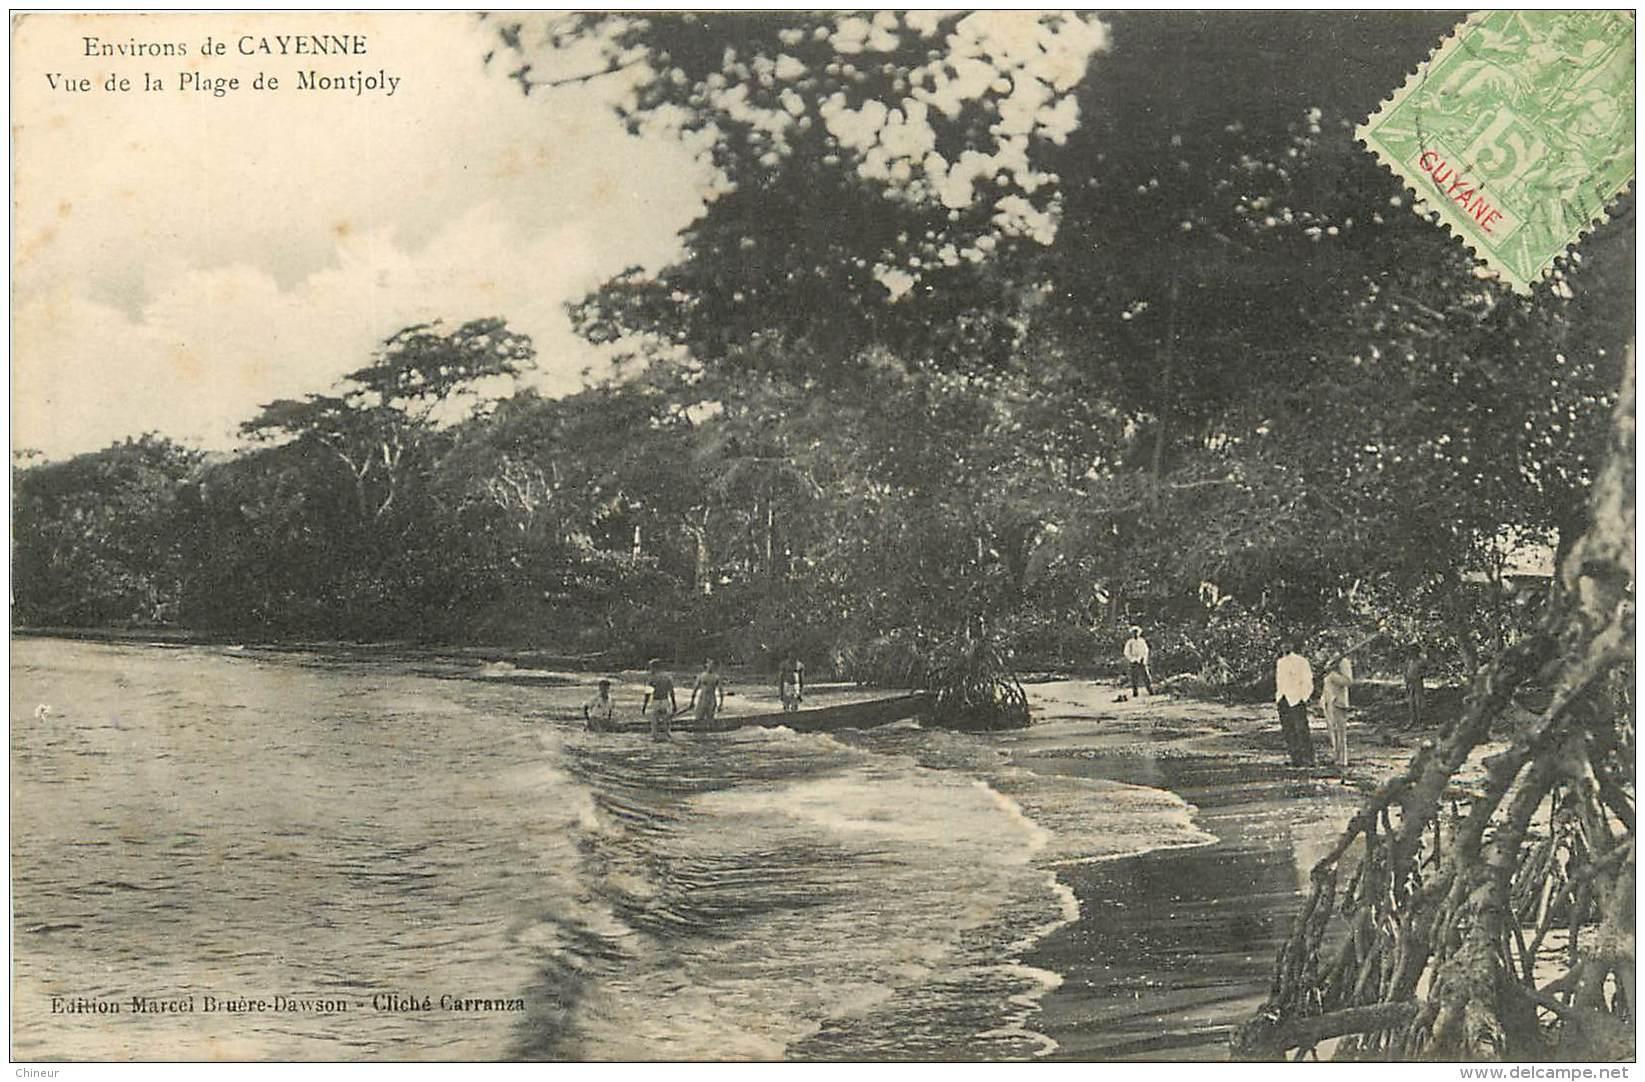 GUYANE ENVIRONS DE CAYENNE VUE DE LA PLAGE DE MONTJOLY - Guyane